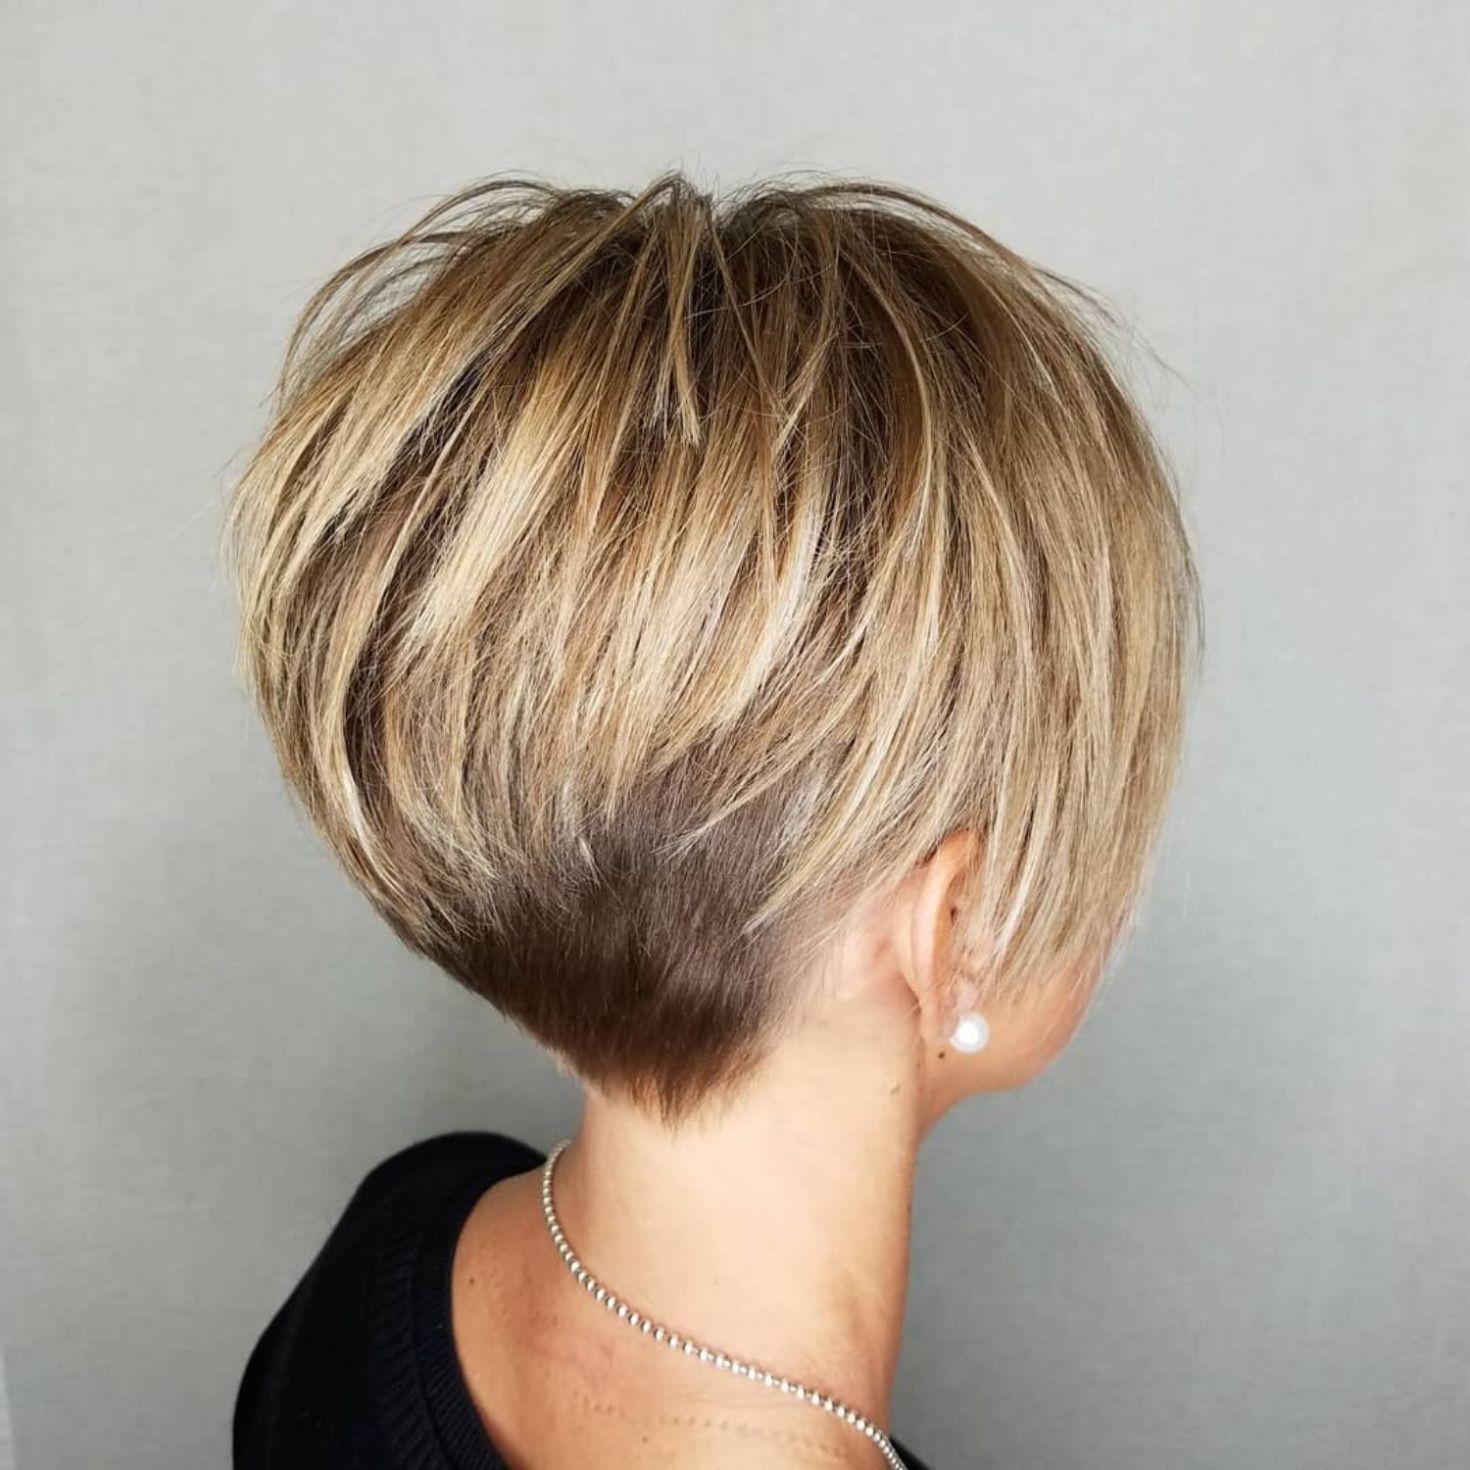 Pixie Haircuts for Thick Hair – 10 Ideas of Ideal Short Haircuts